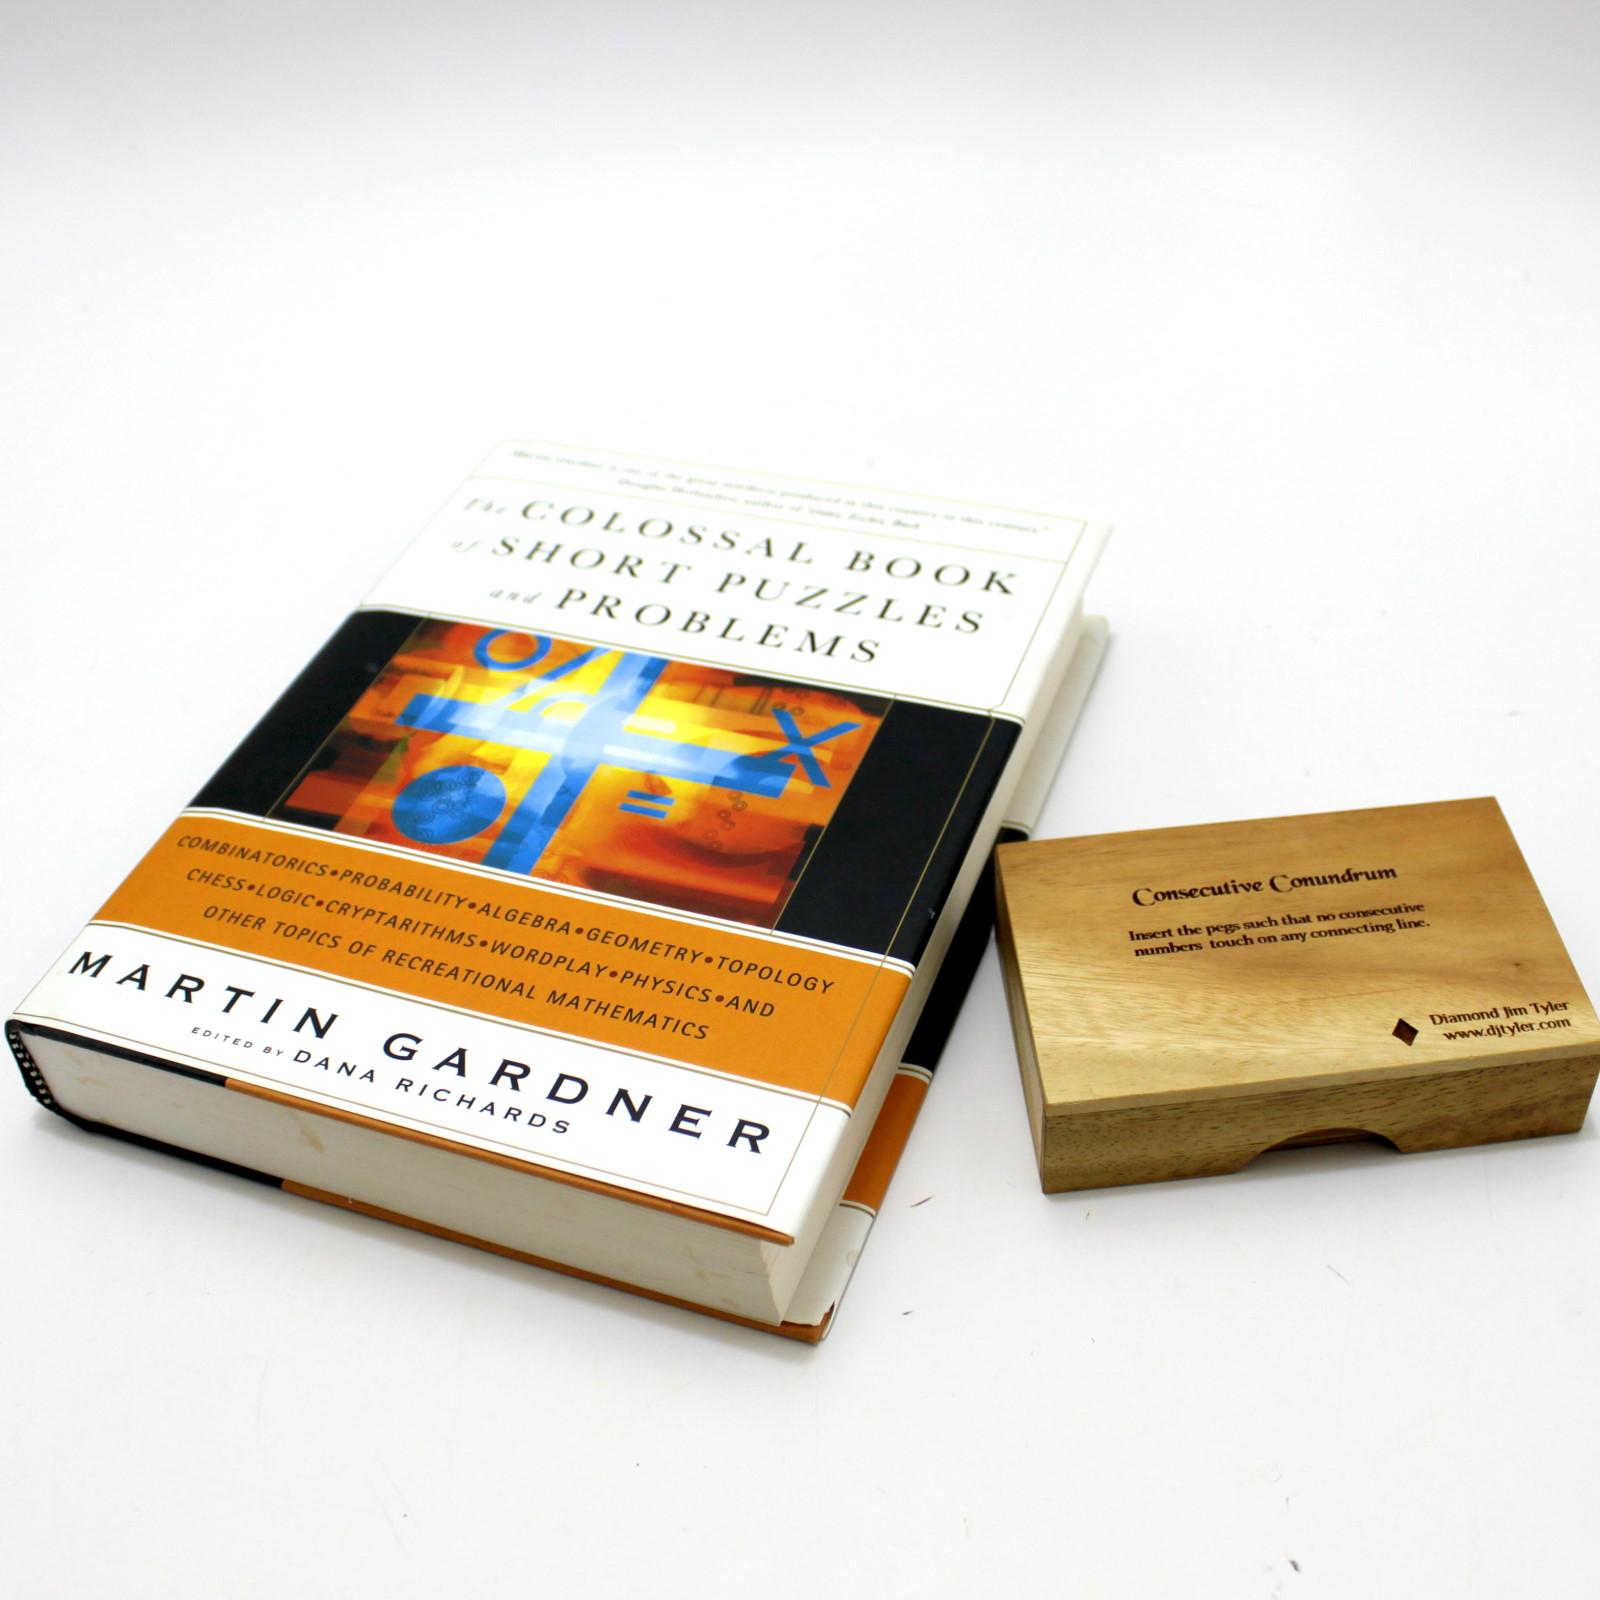 Consecutive Conundrum + Colossal Book by Martin Gardner